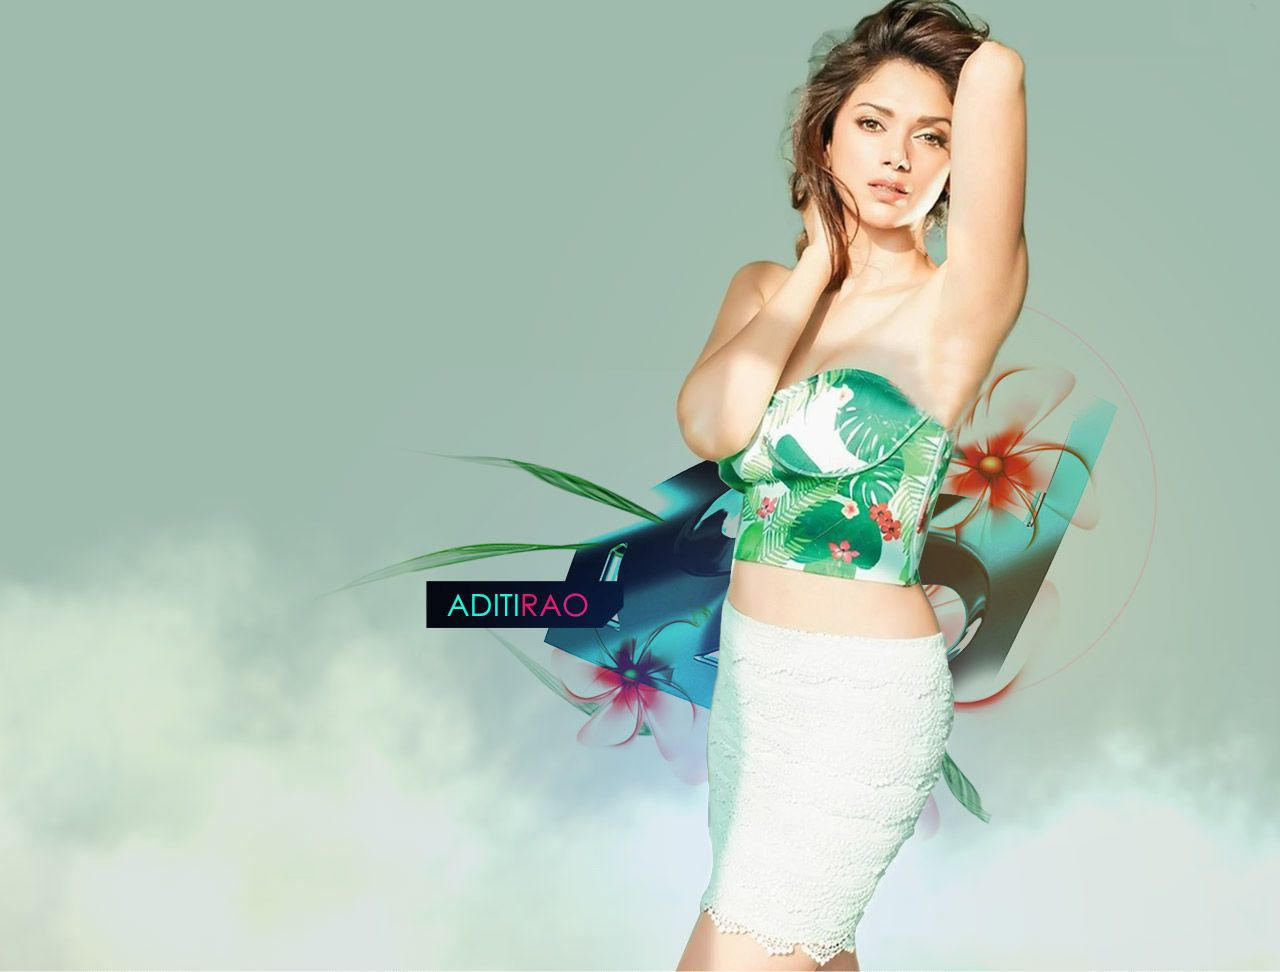 Aditi Rao Hydari Bikini Wallpapers HD